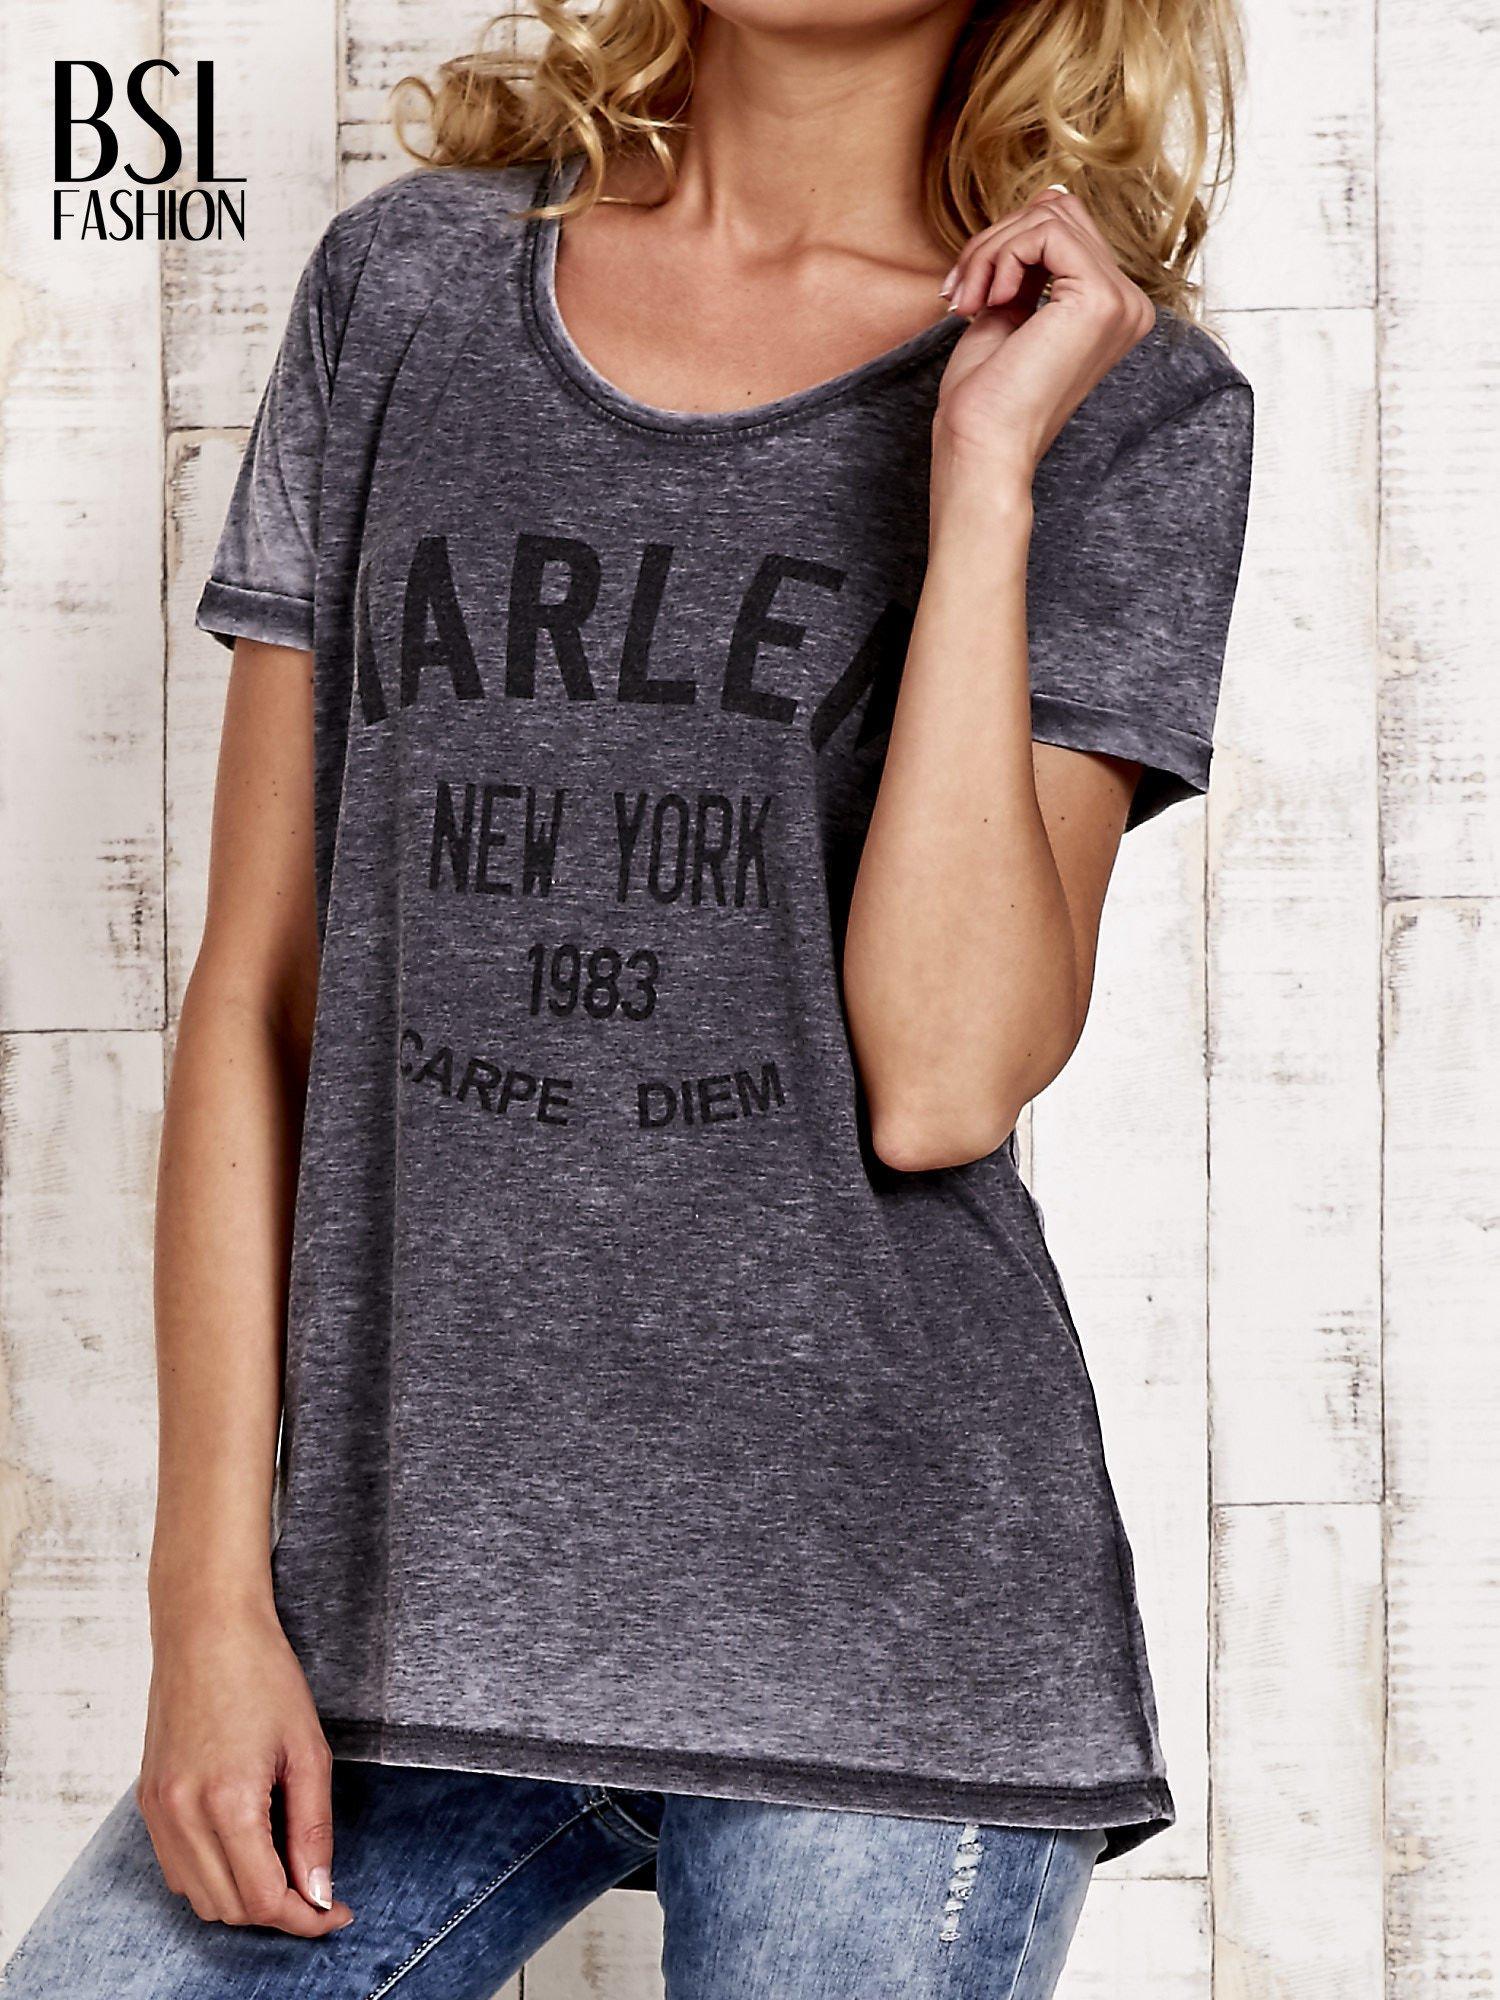 Szary t-shirt z napisem HARLEM efekt acid wash                                  zdj.                                  1